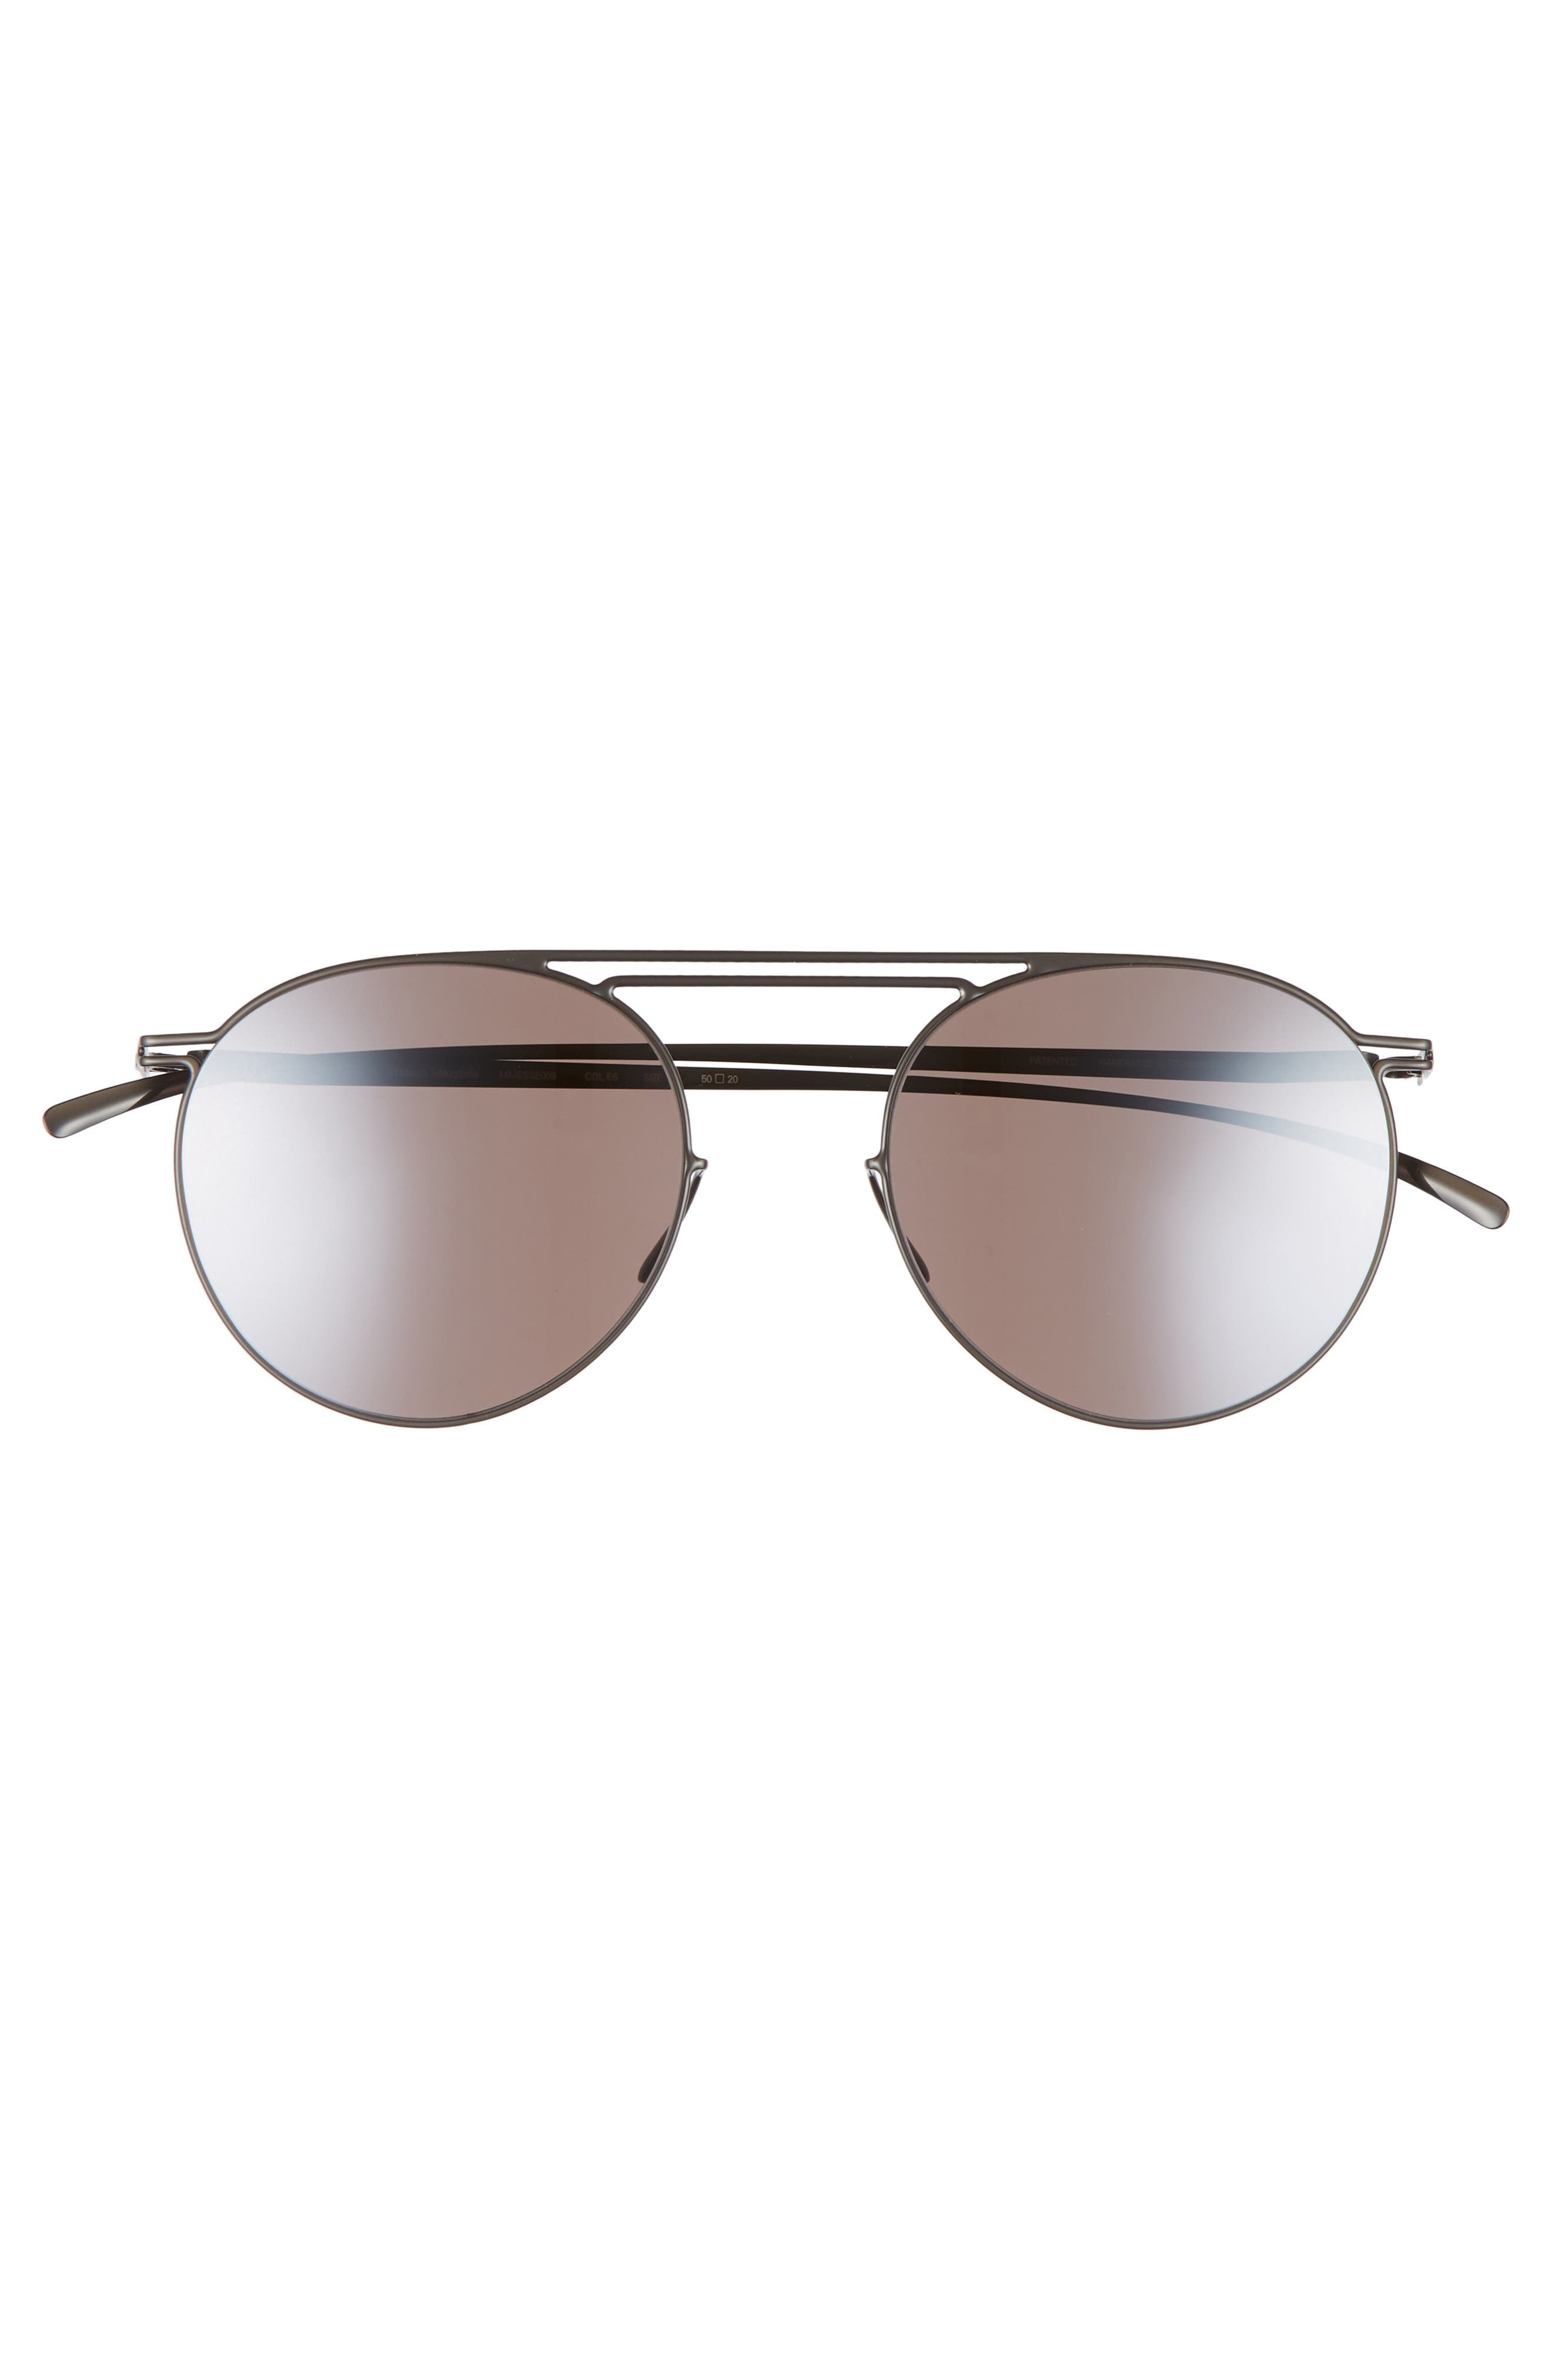 MMESSE009 50mm Sunglasses,                             Alternate thumbnail 3, color,